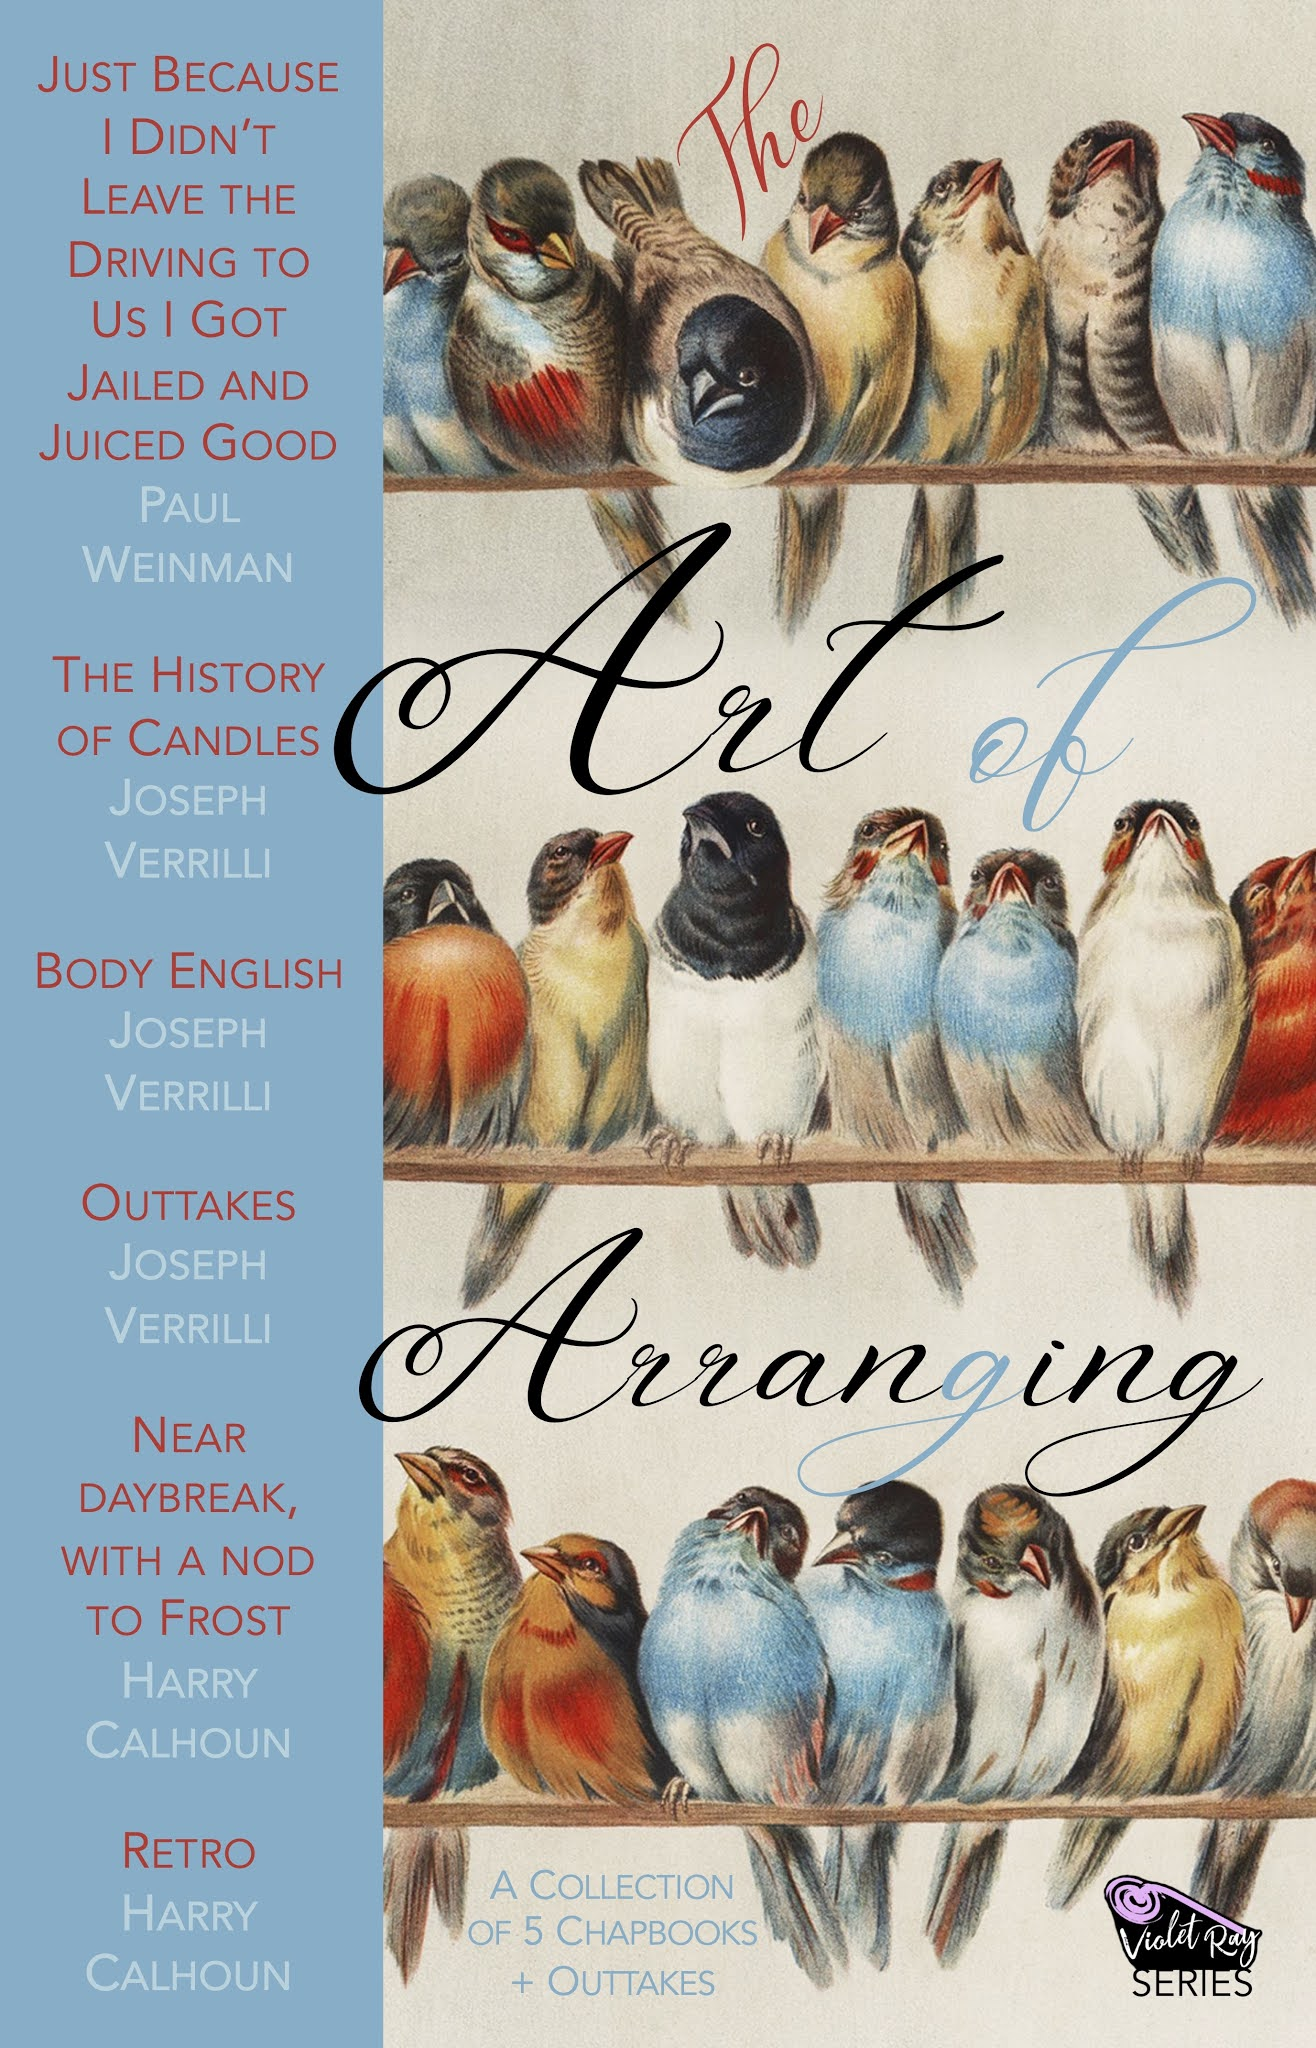 The Art of Arranging cover artwork